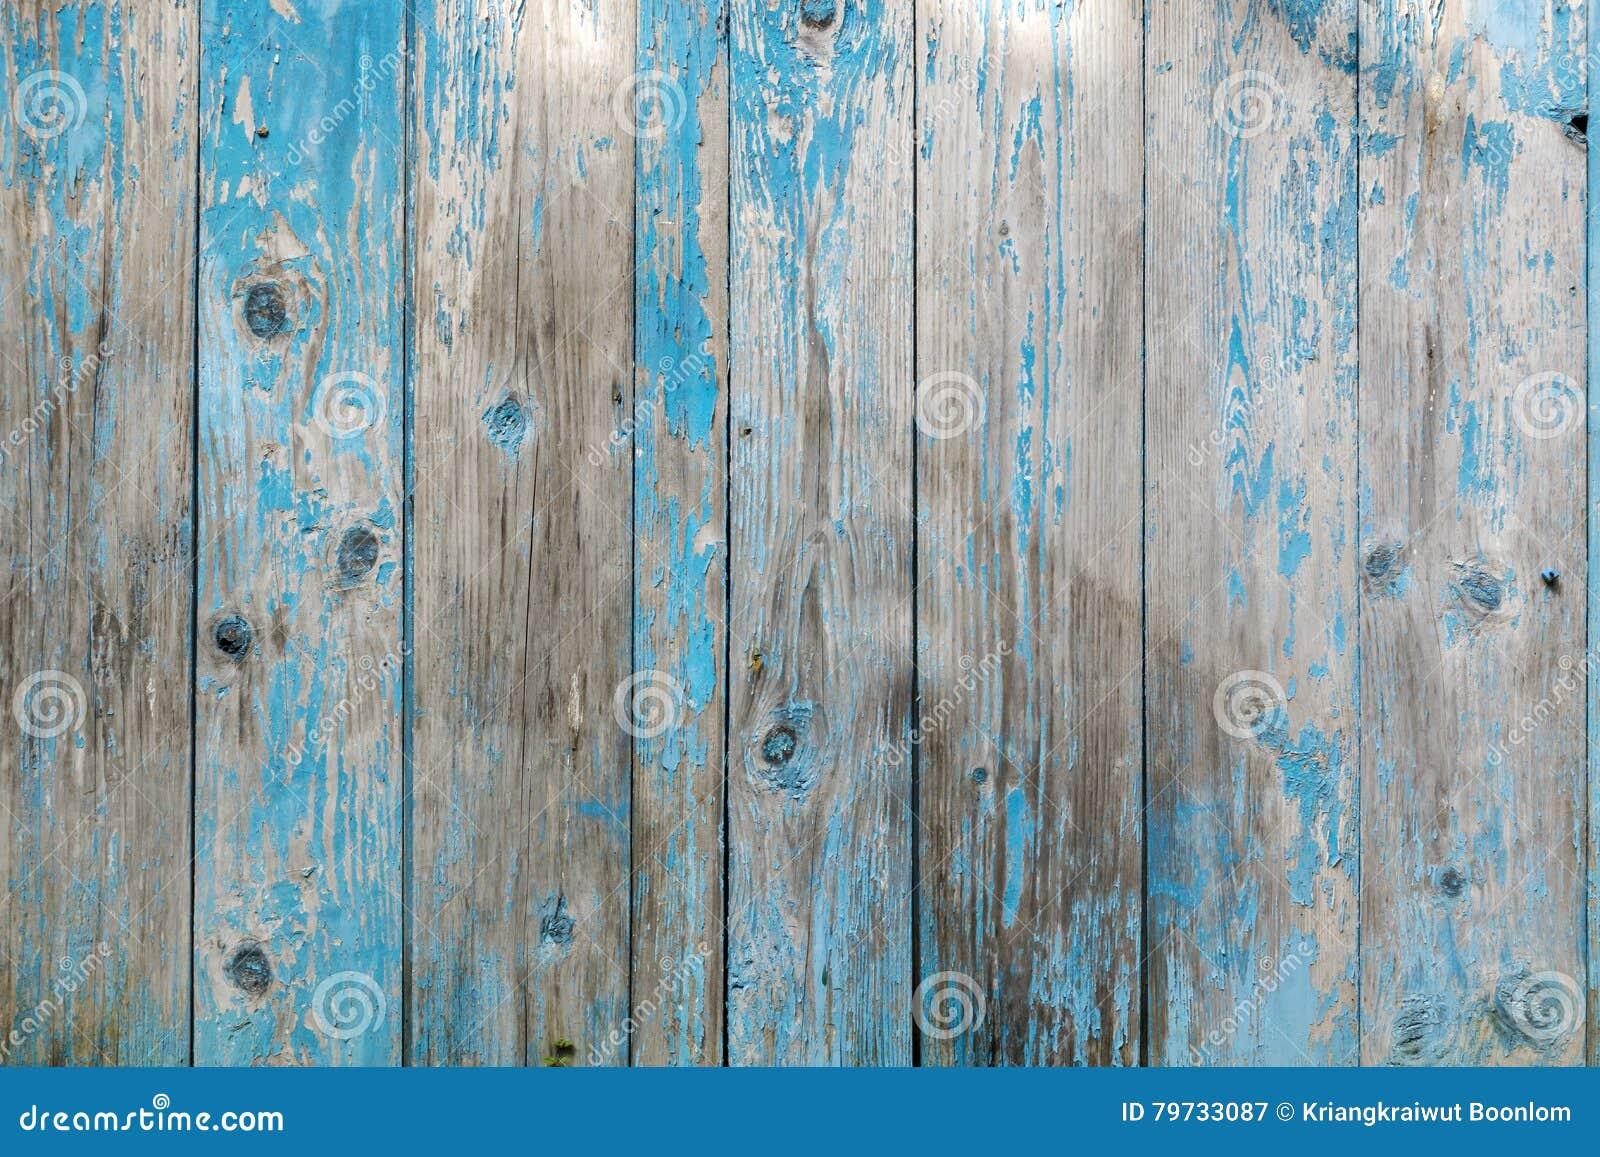 vintage blue wood background - photo #48